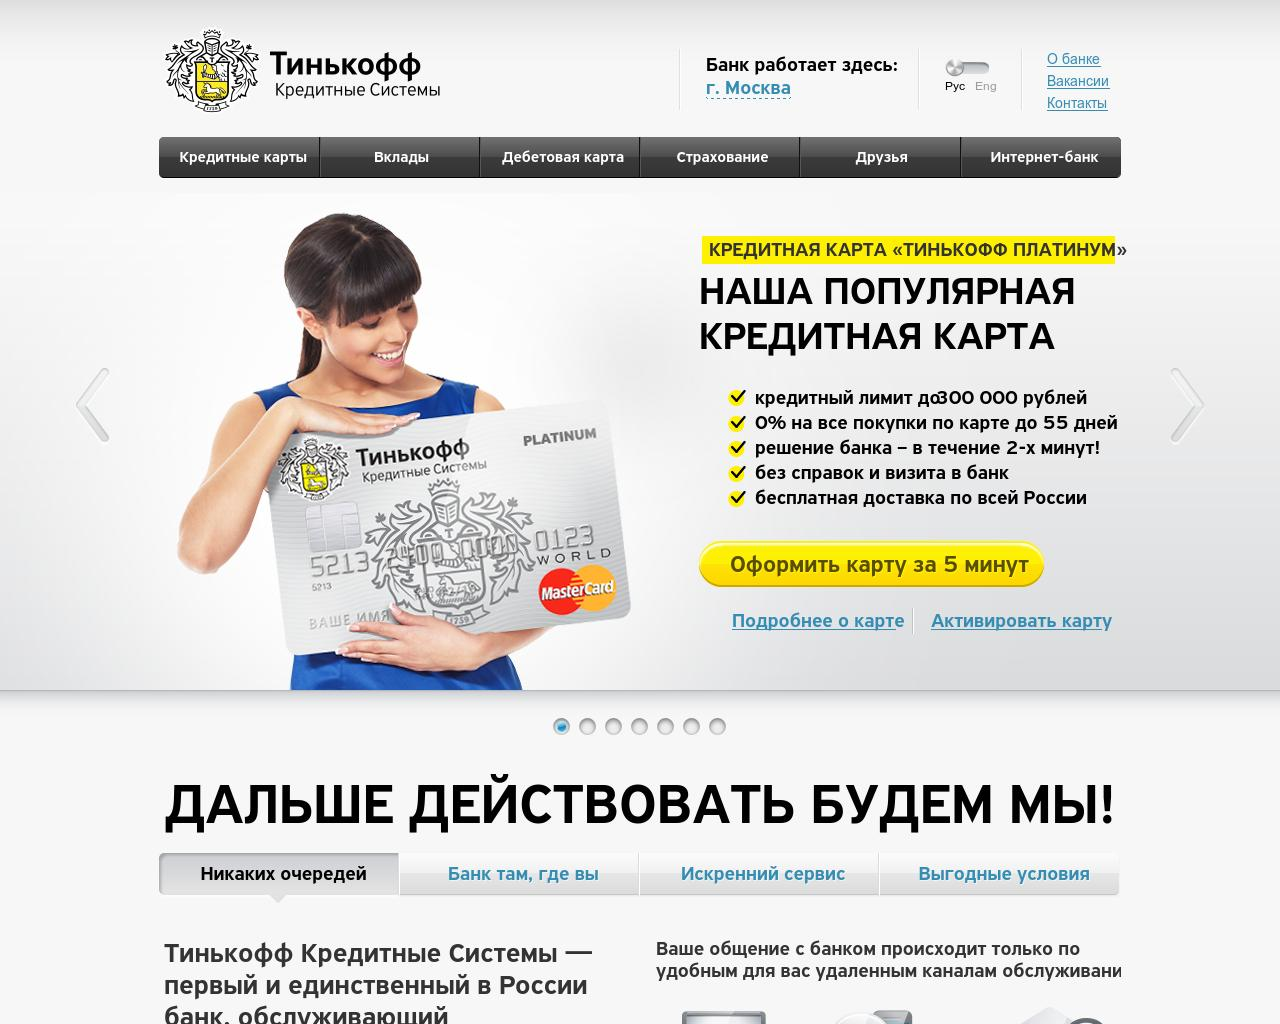 Официальная страница банка